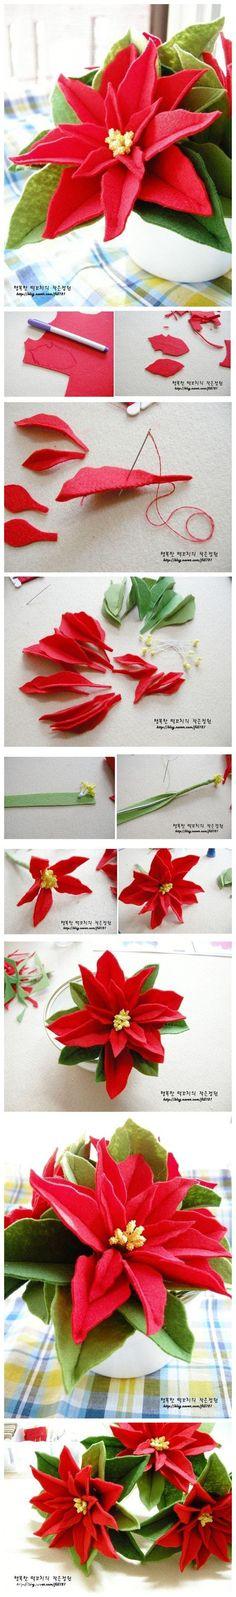 Diy Beautiful Fabric Flower | Best DIY Ideas